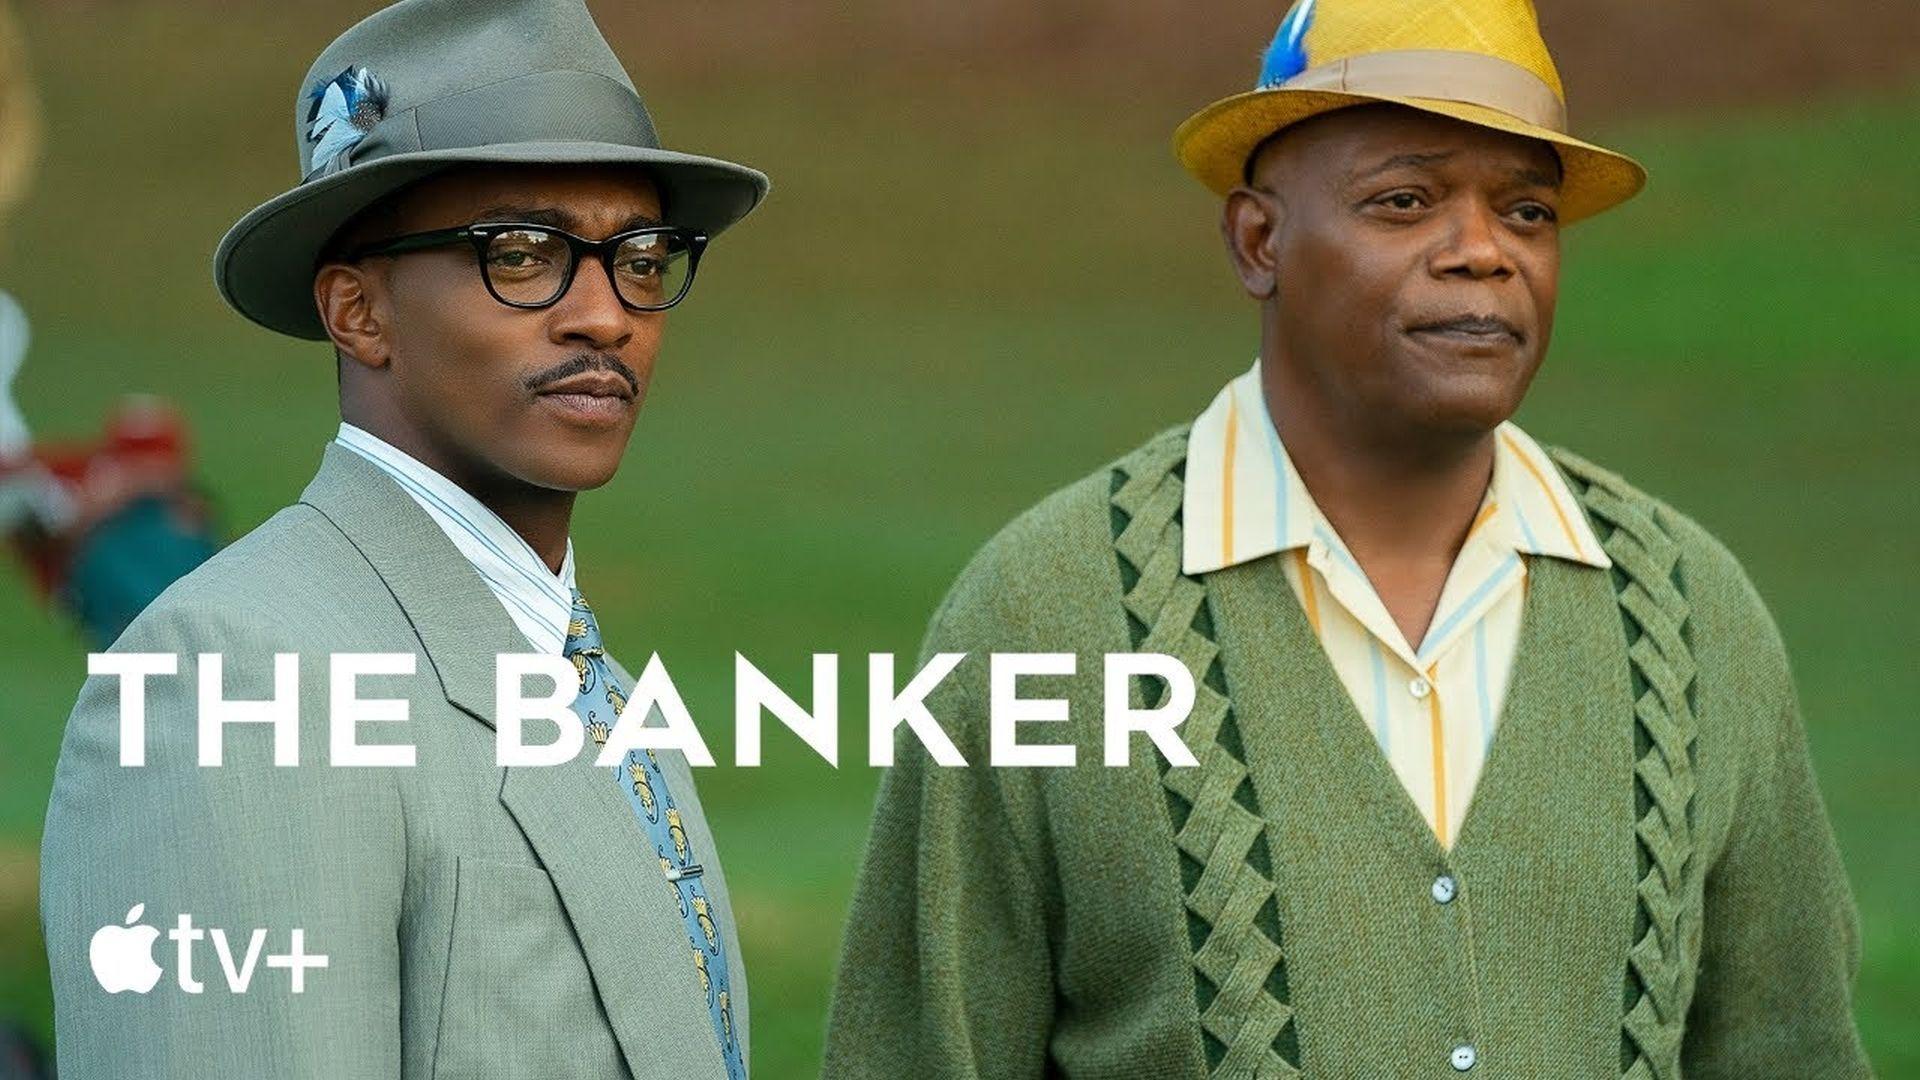 Odwołana premiera filmu The Banker na AFI Fest w Hollywood